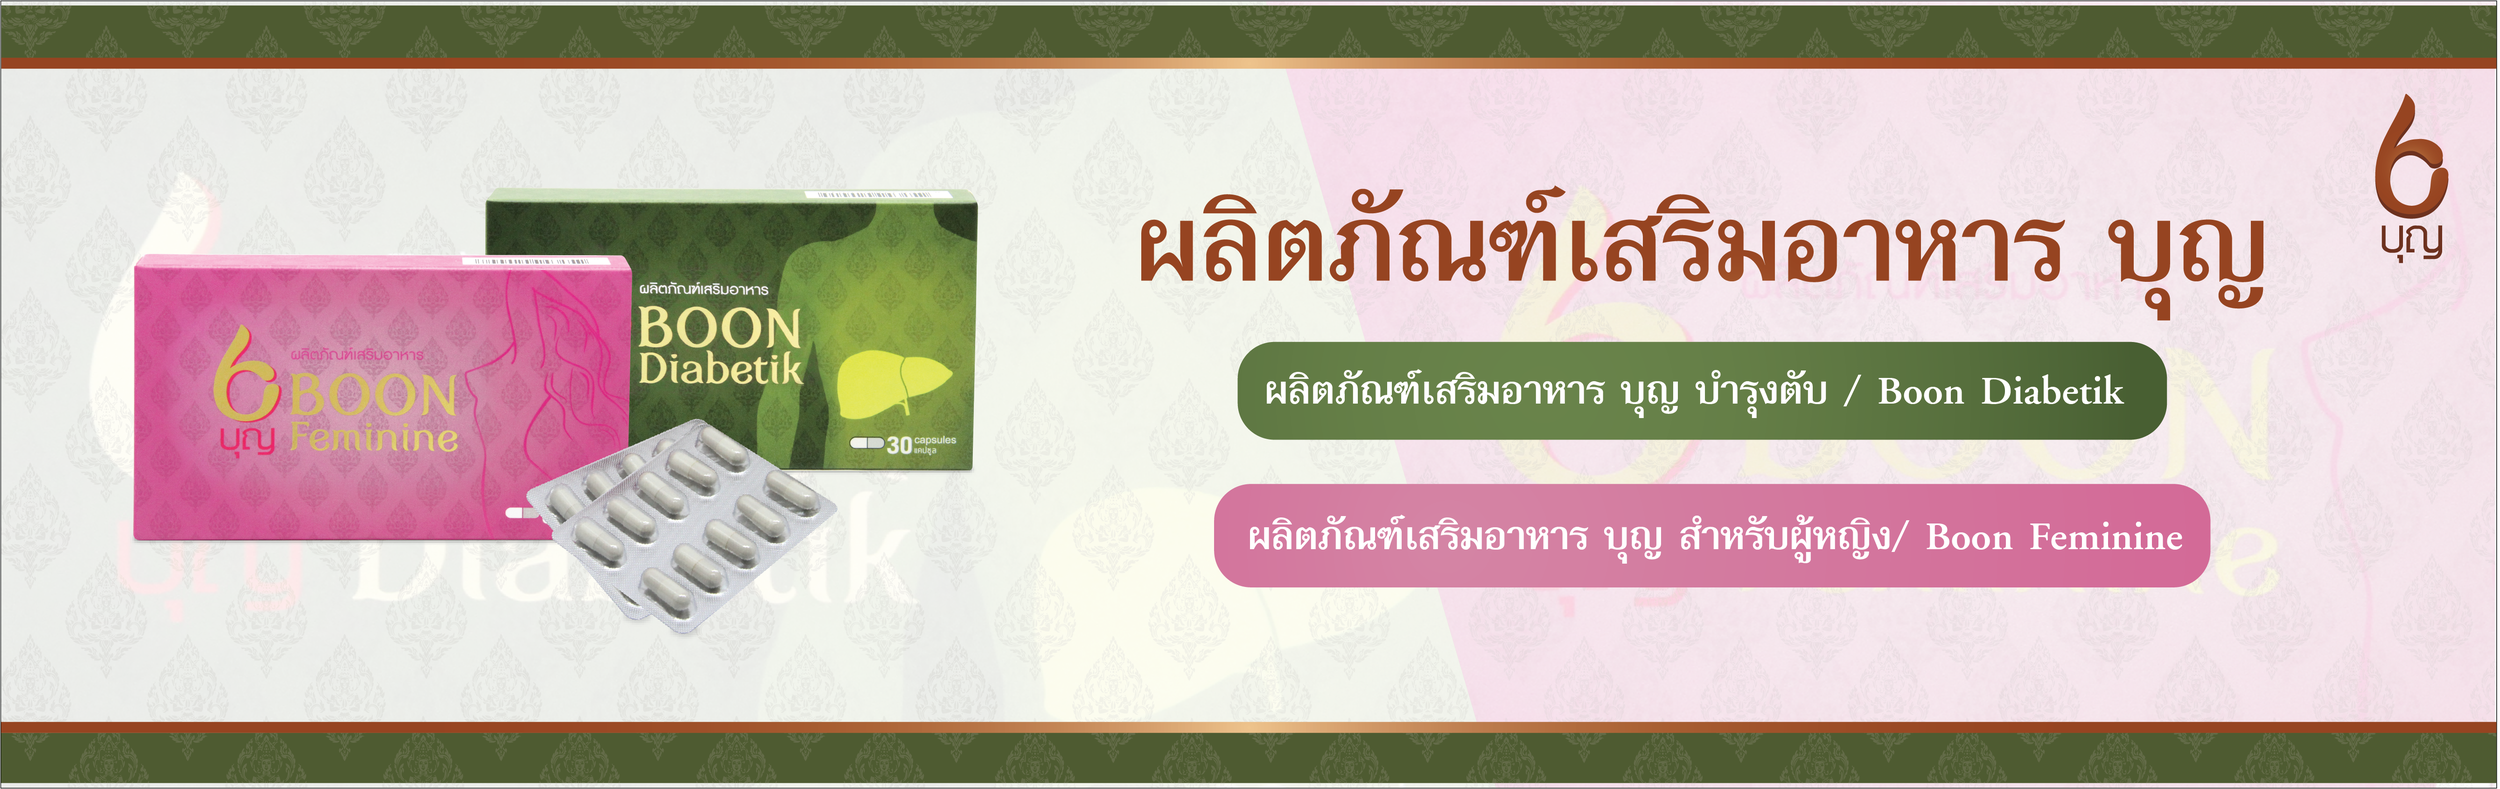 Banner ยาบุญ-02.png